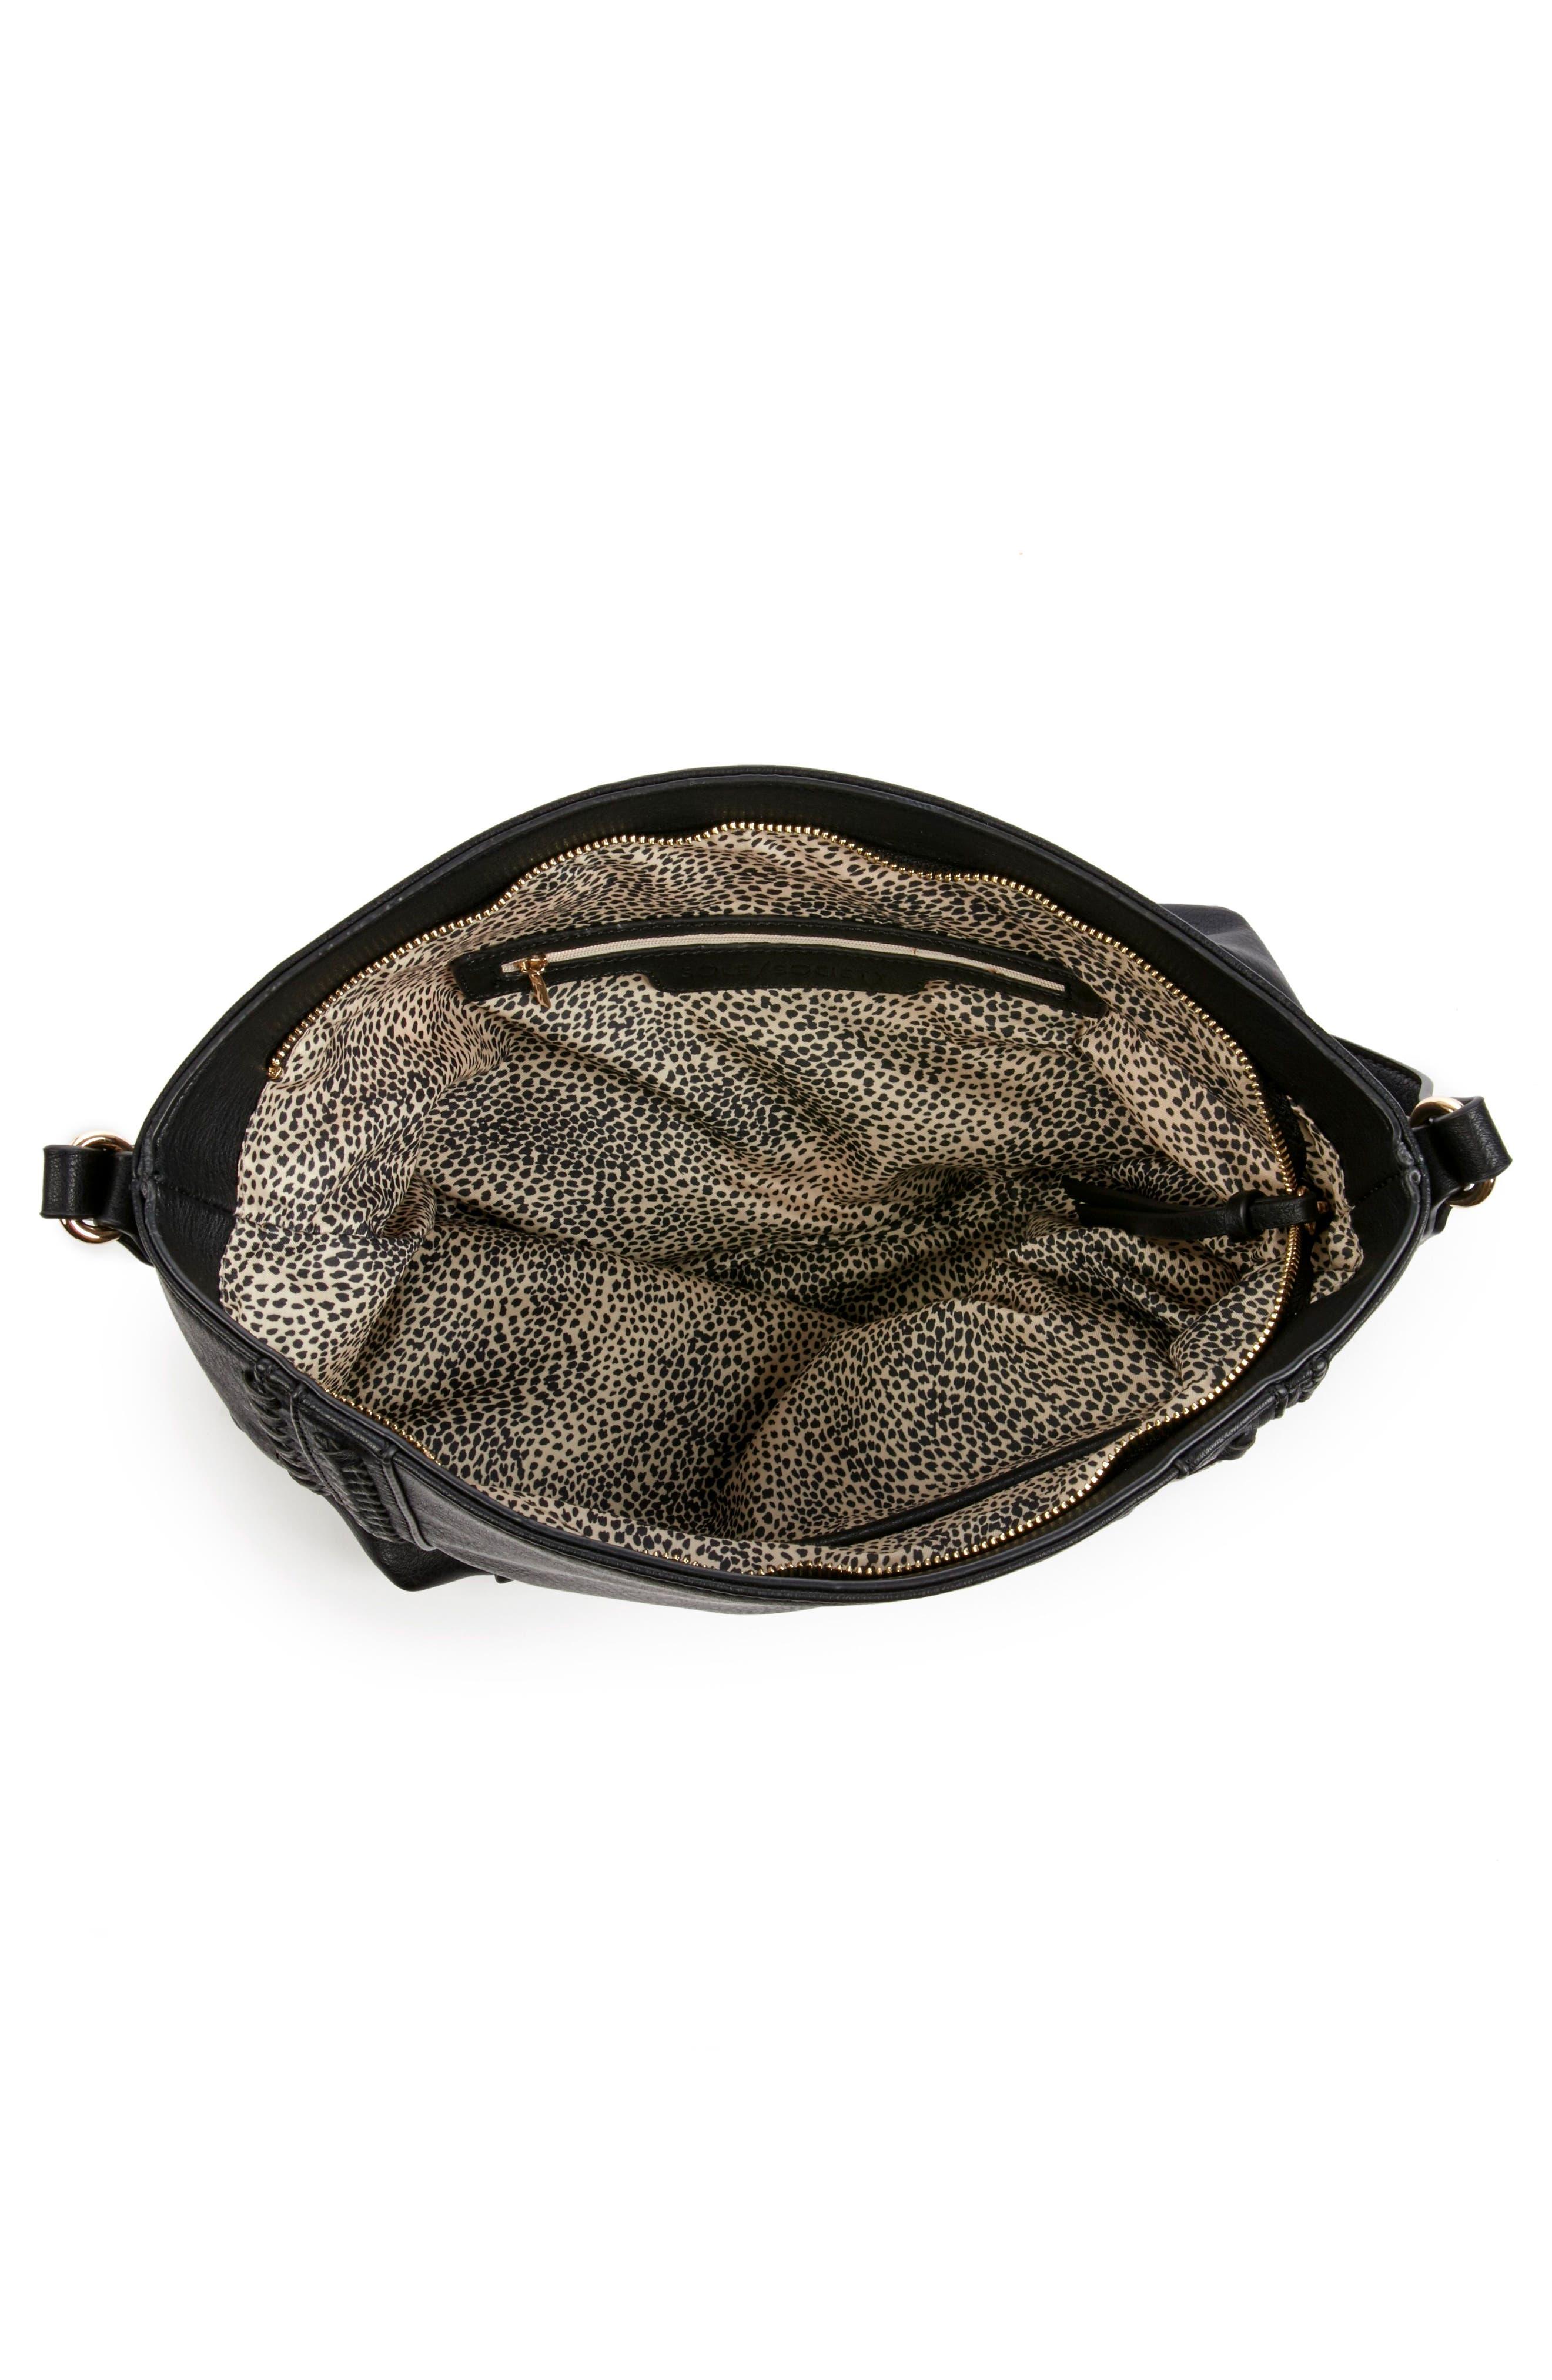 Destin Faux Leather Hobo Bag,                             Alternate thumbnail 3, color,                             001